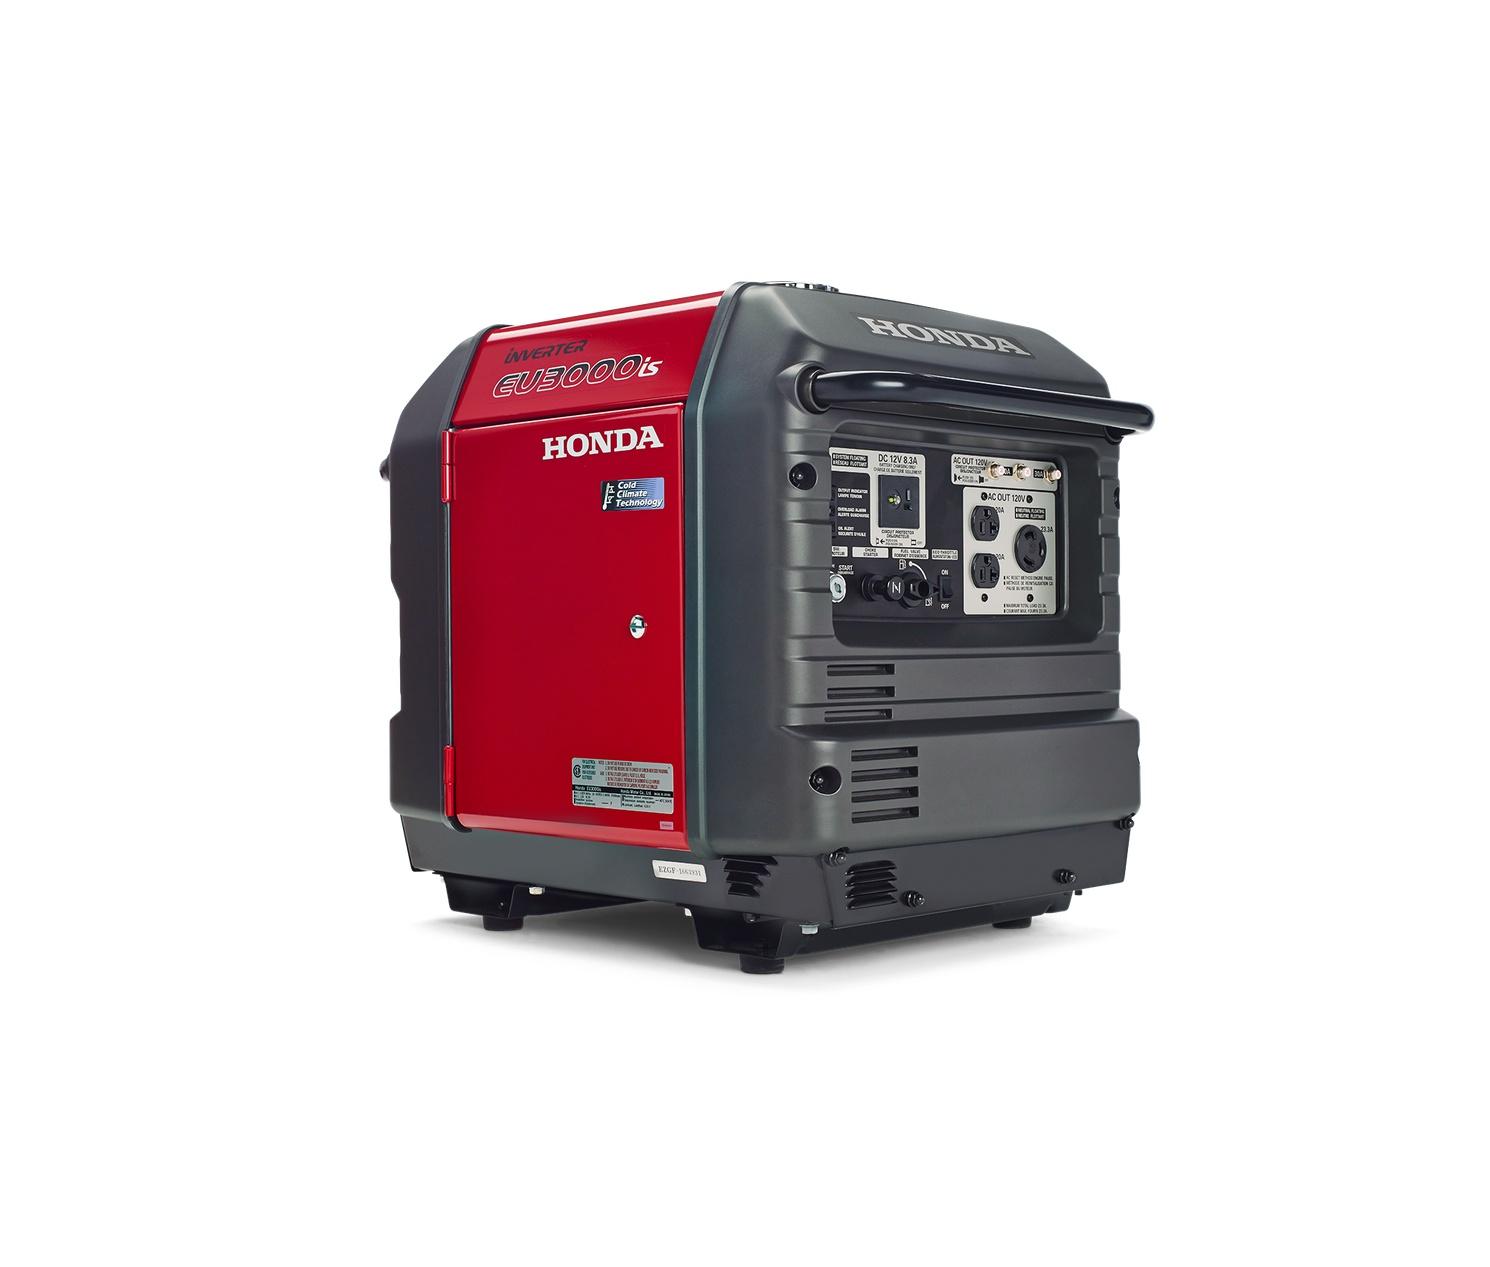 Honda Génératrices EU3000isC4